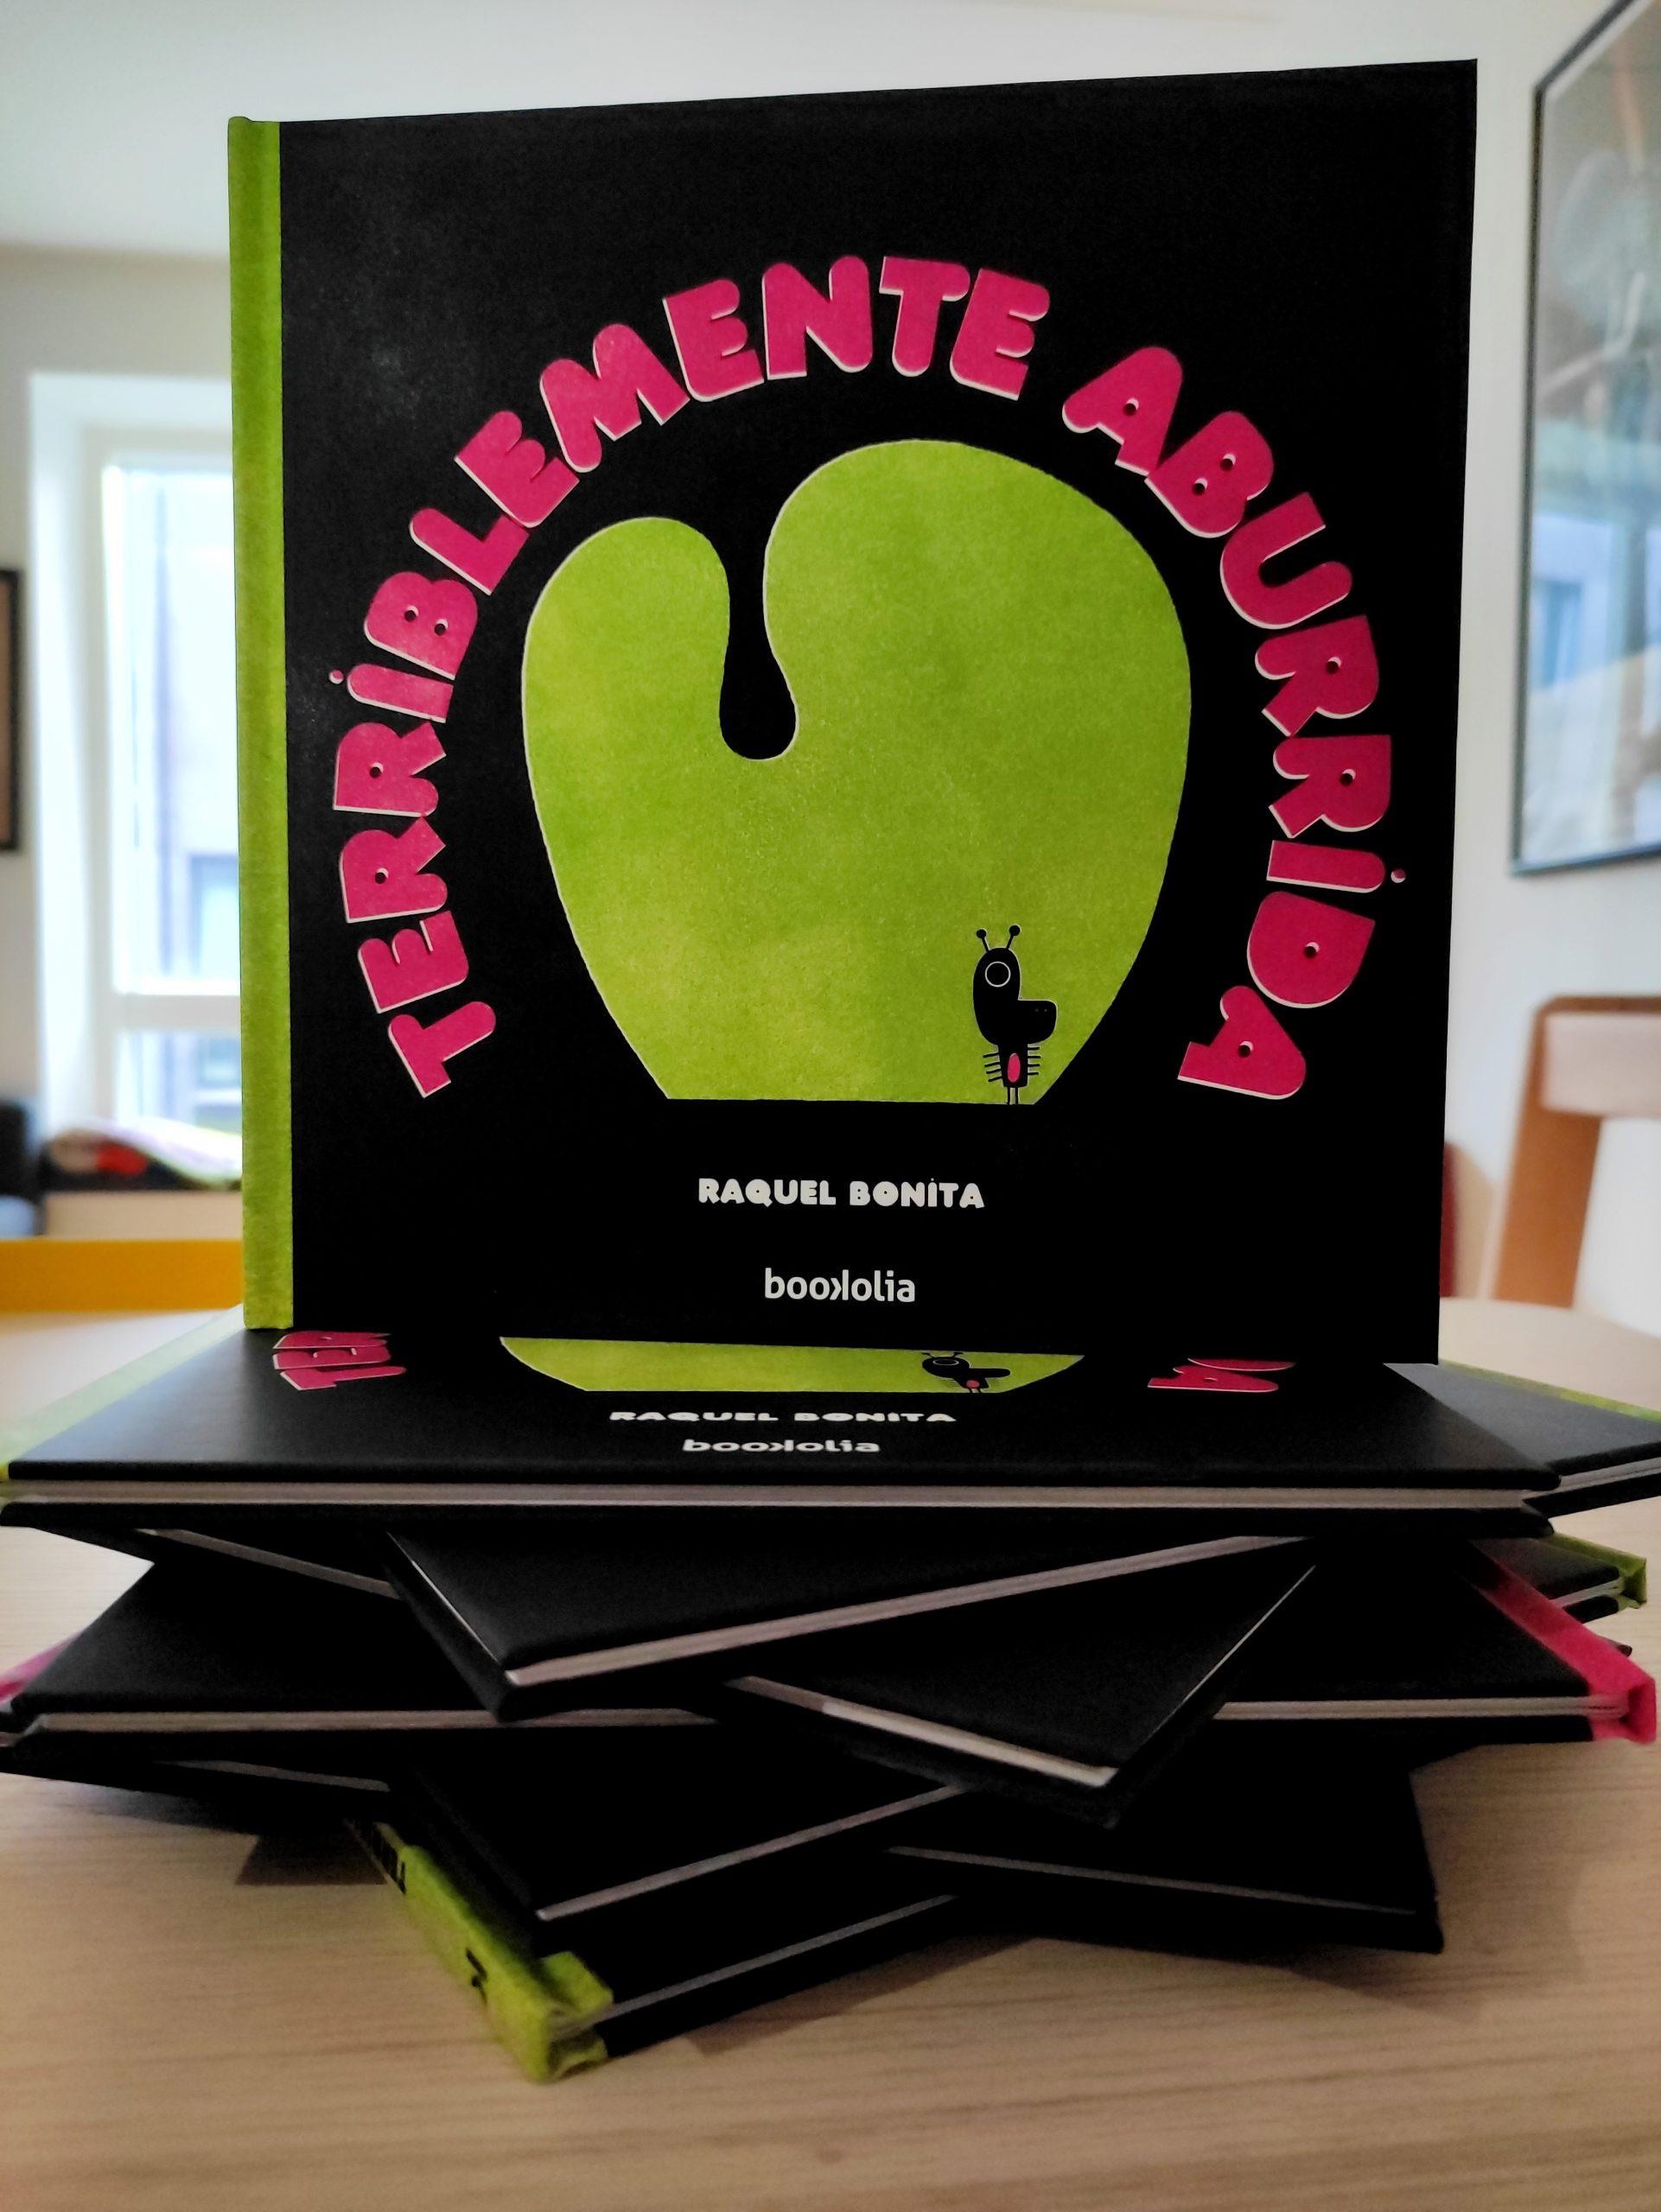 Terriblemente aburrida - Foto - Raquel Bonita